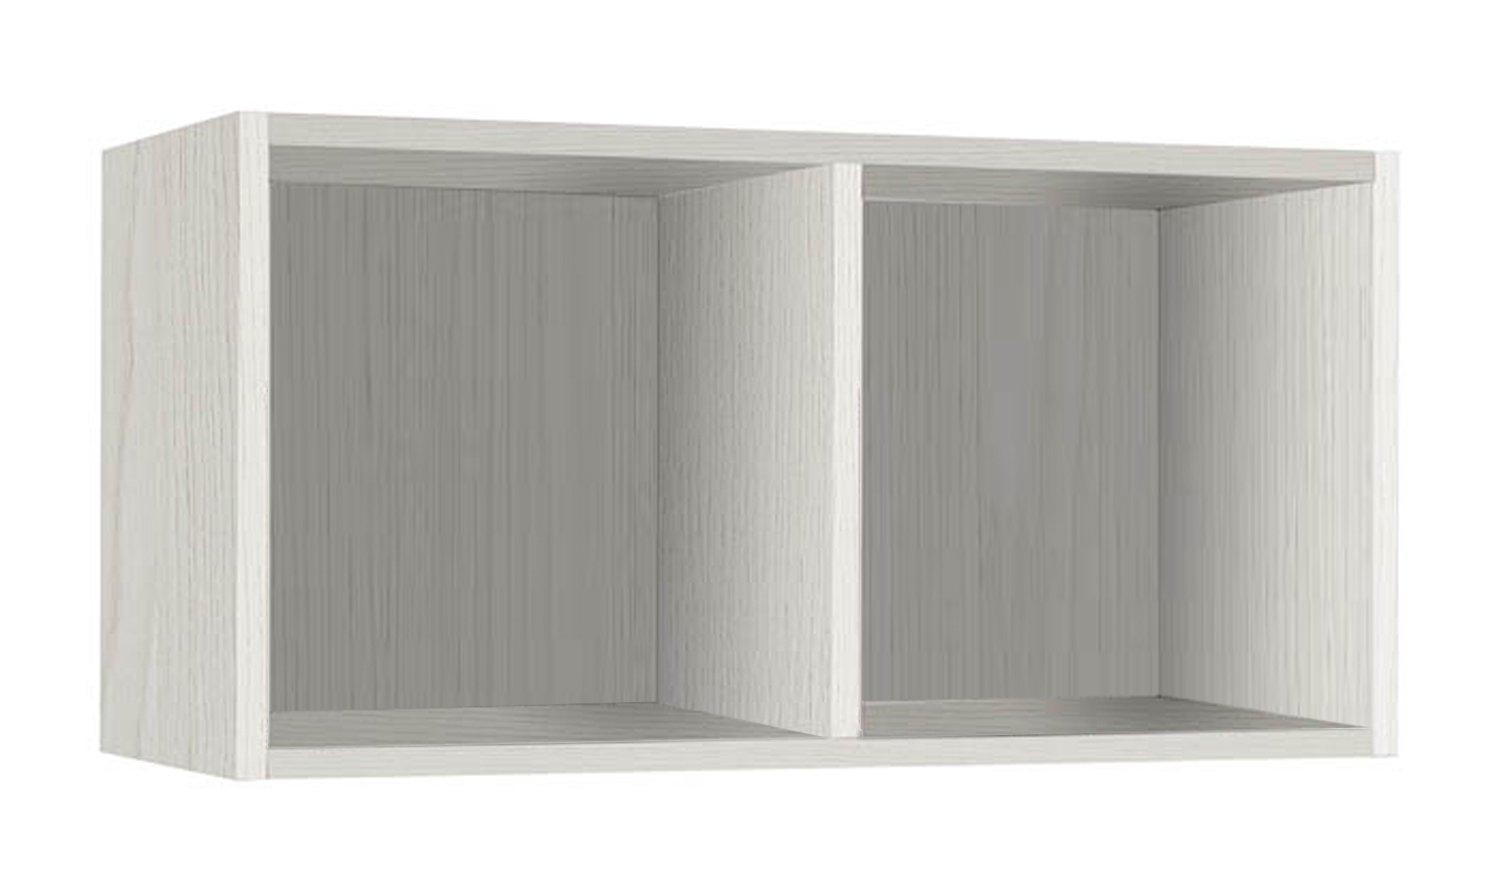 Giessegi Job 9335, estantería Horizontal para Colgar en la Pared, Madera, 316x 80x 40cm it home GIET66